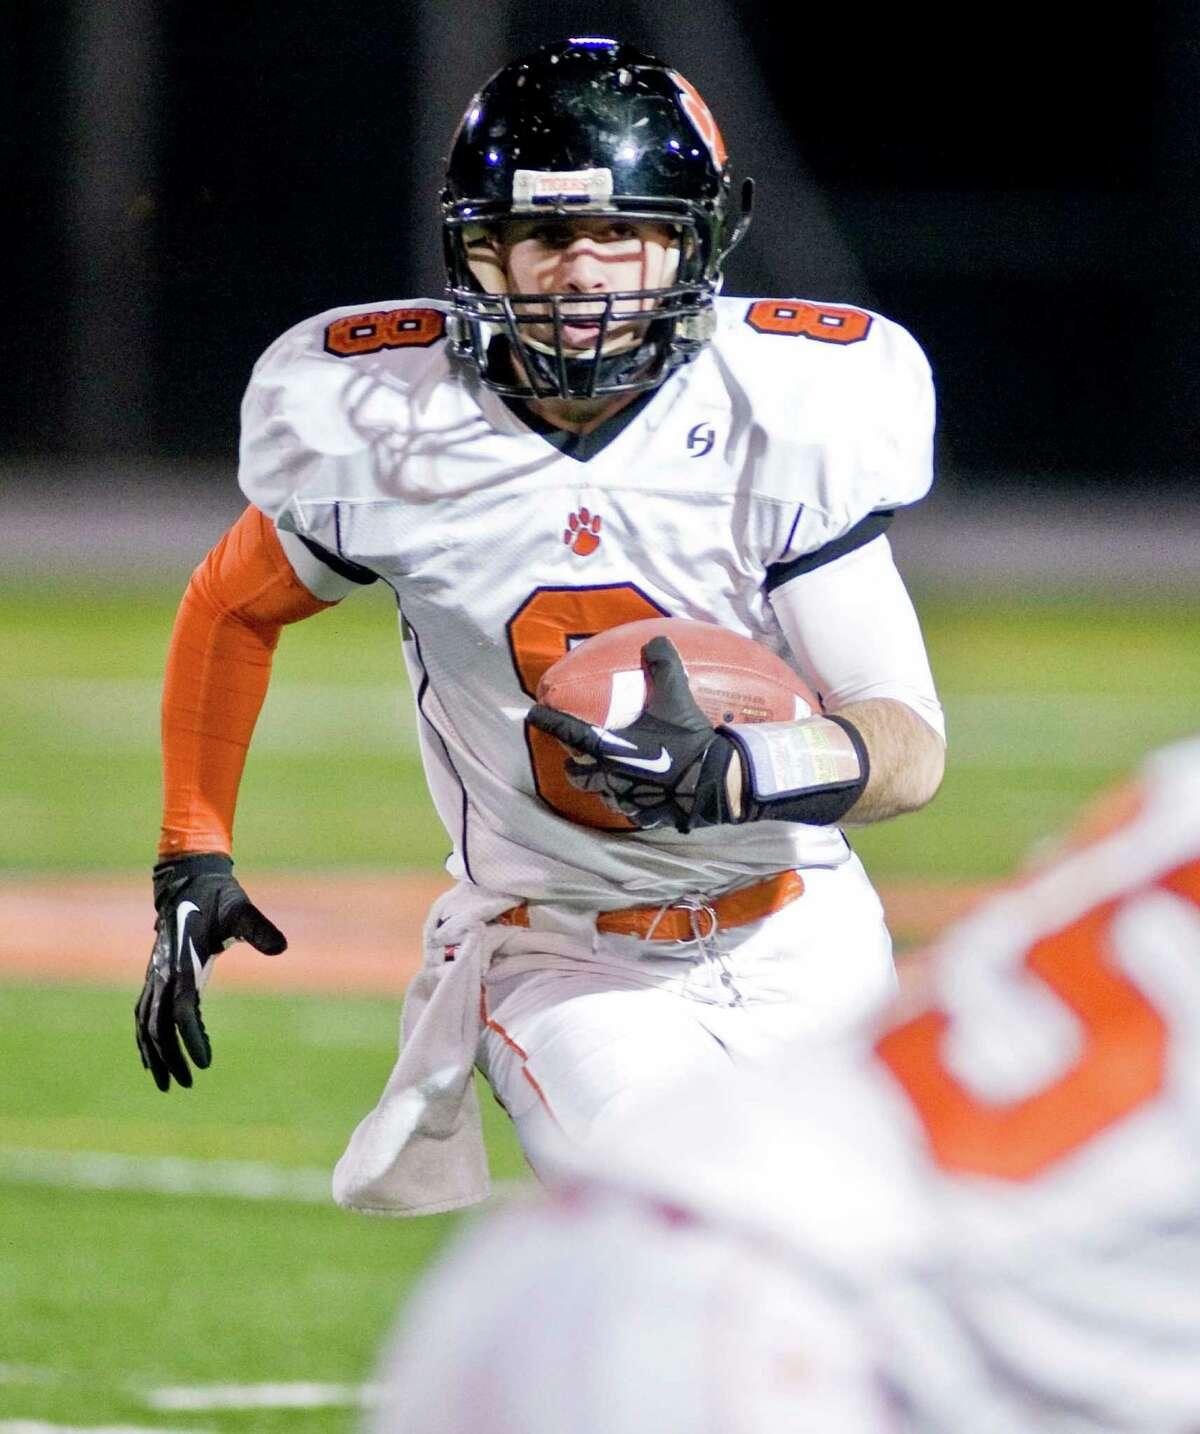 Ridgefield High School quarterback Connor Rowe looks for a lane through the Danbury High School defense in a game at Danbury. Wednesday, Nov. 21, 2012